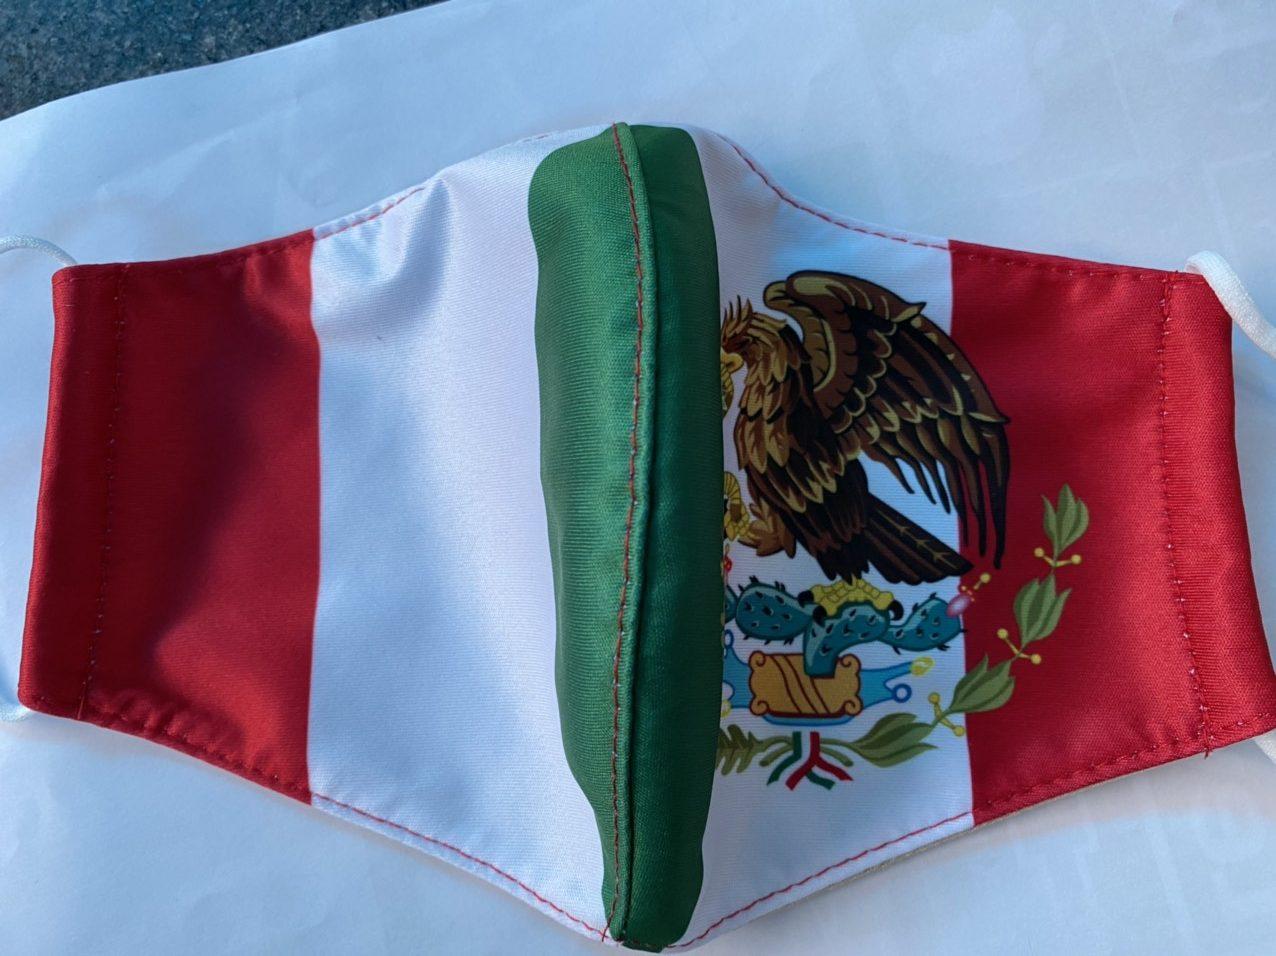 Khẩu Trang In Logo Quốc Huy Mexico 2 Lớp - Mẫu Khẩu Trang In 3D Cờ Mexico 7